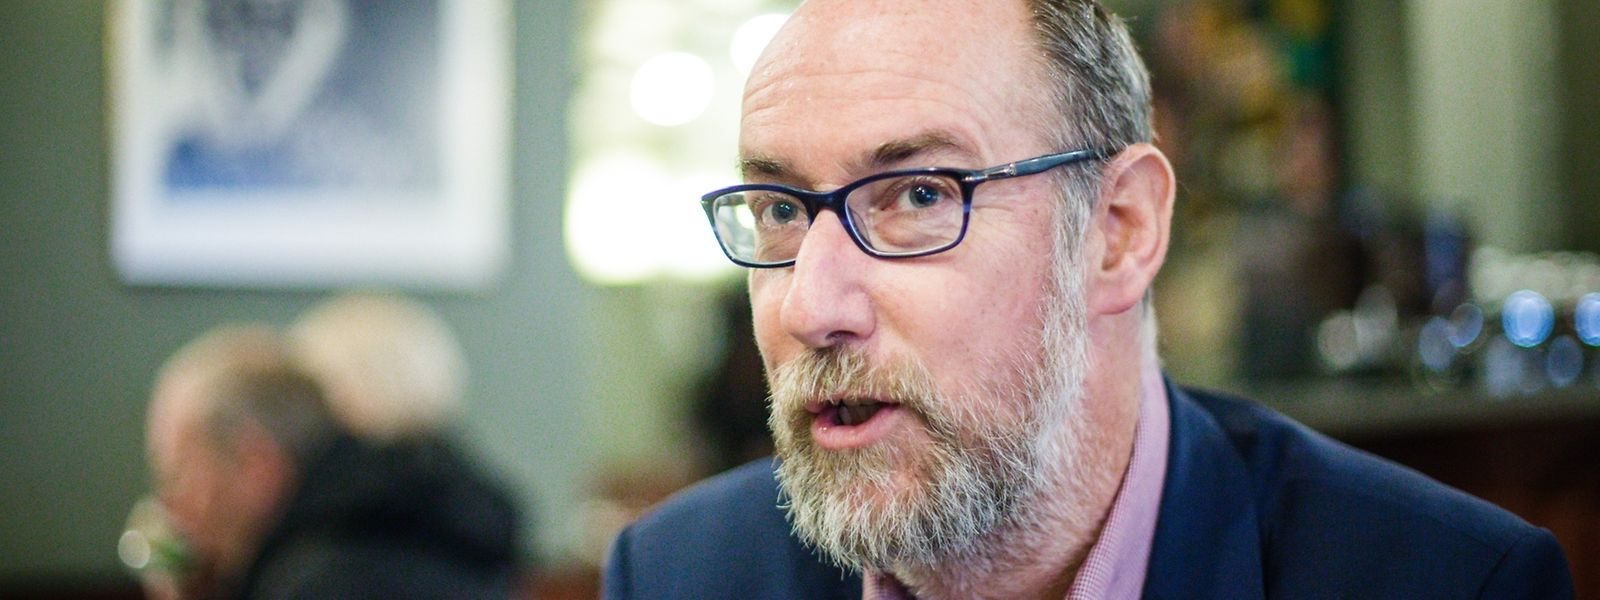 Gilles Baum ist seit dem 4. Februar DP-Fraktionschef.